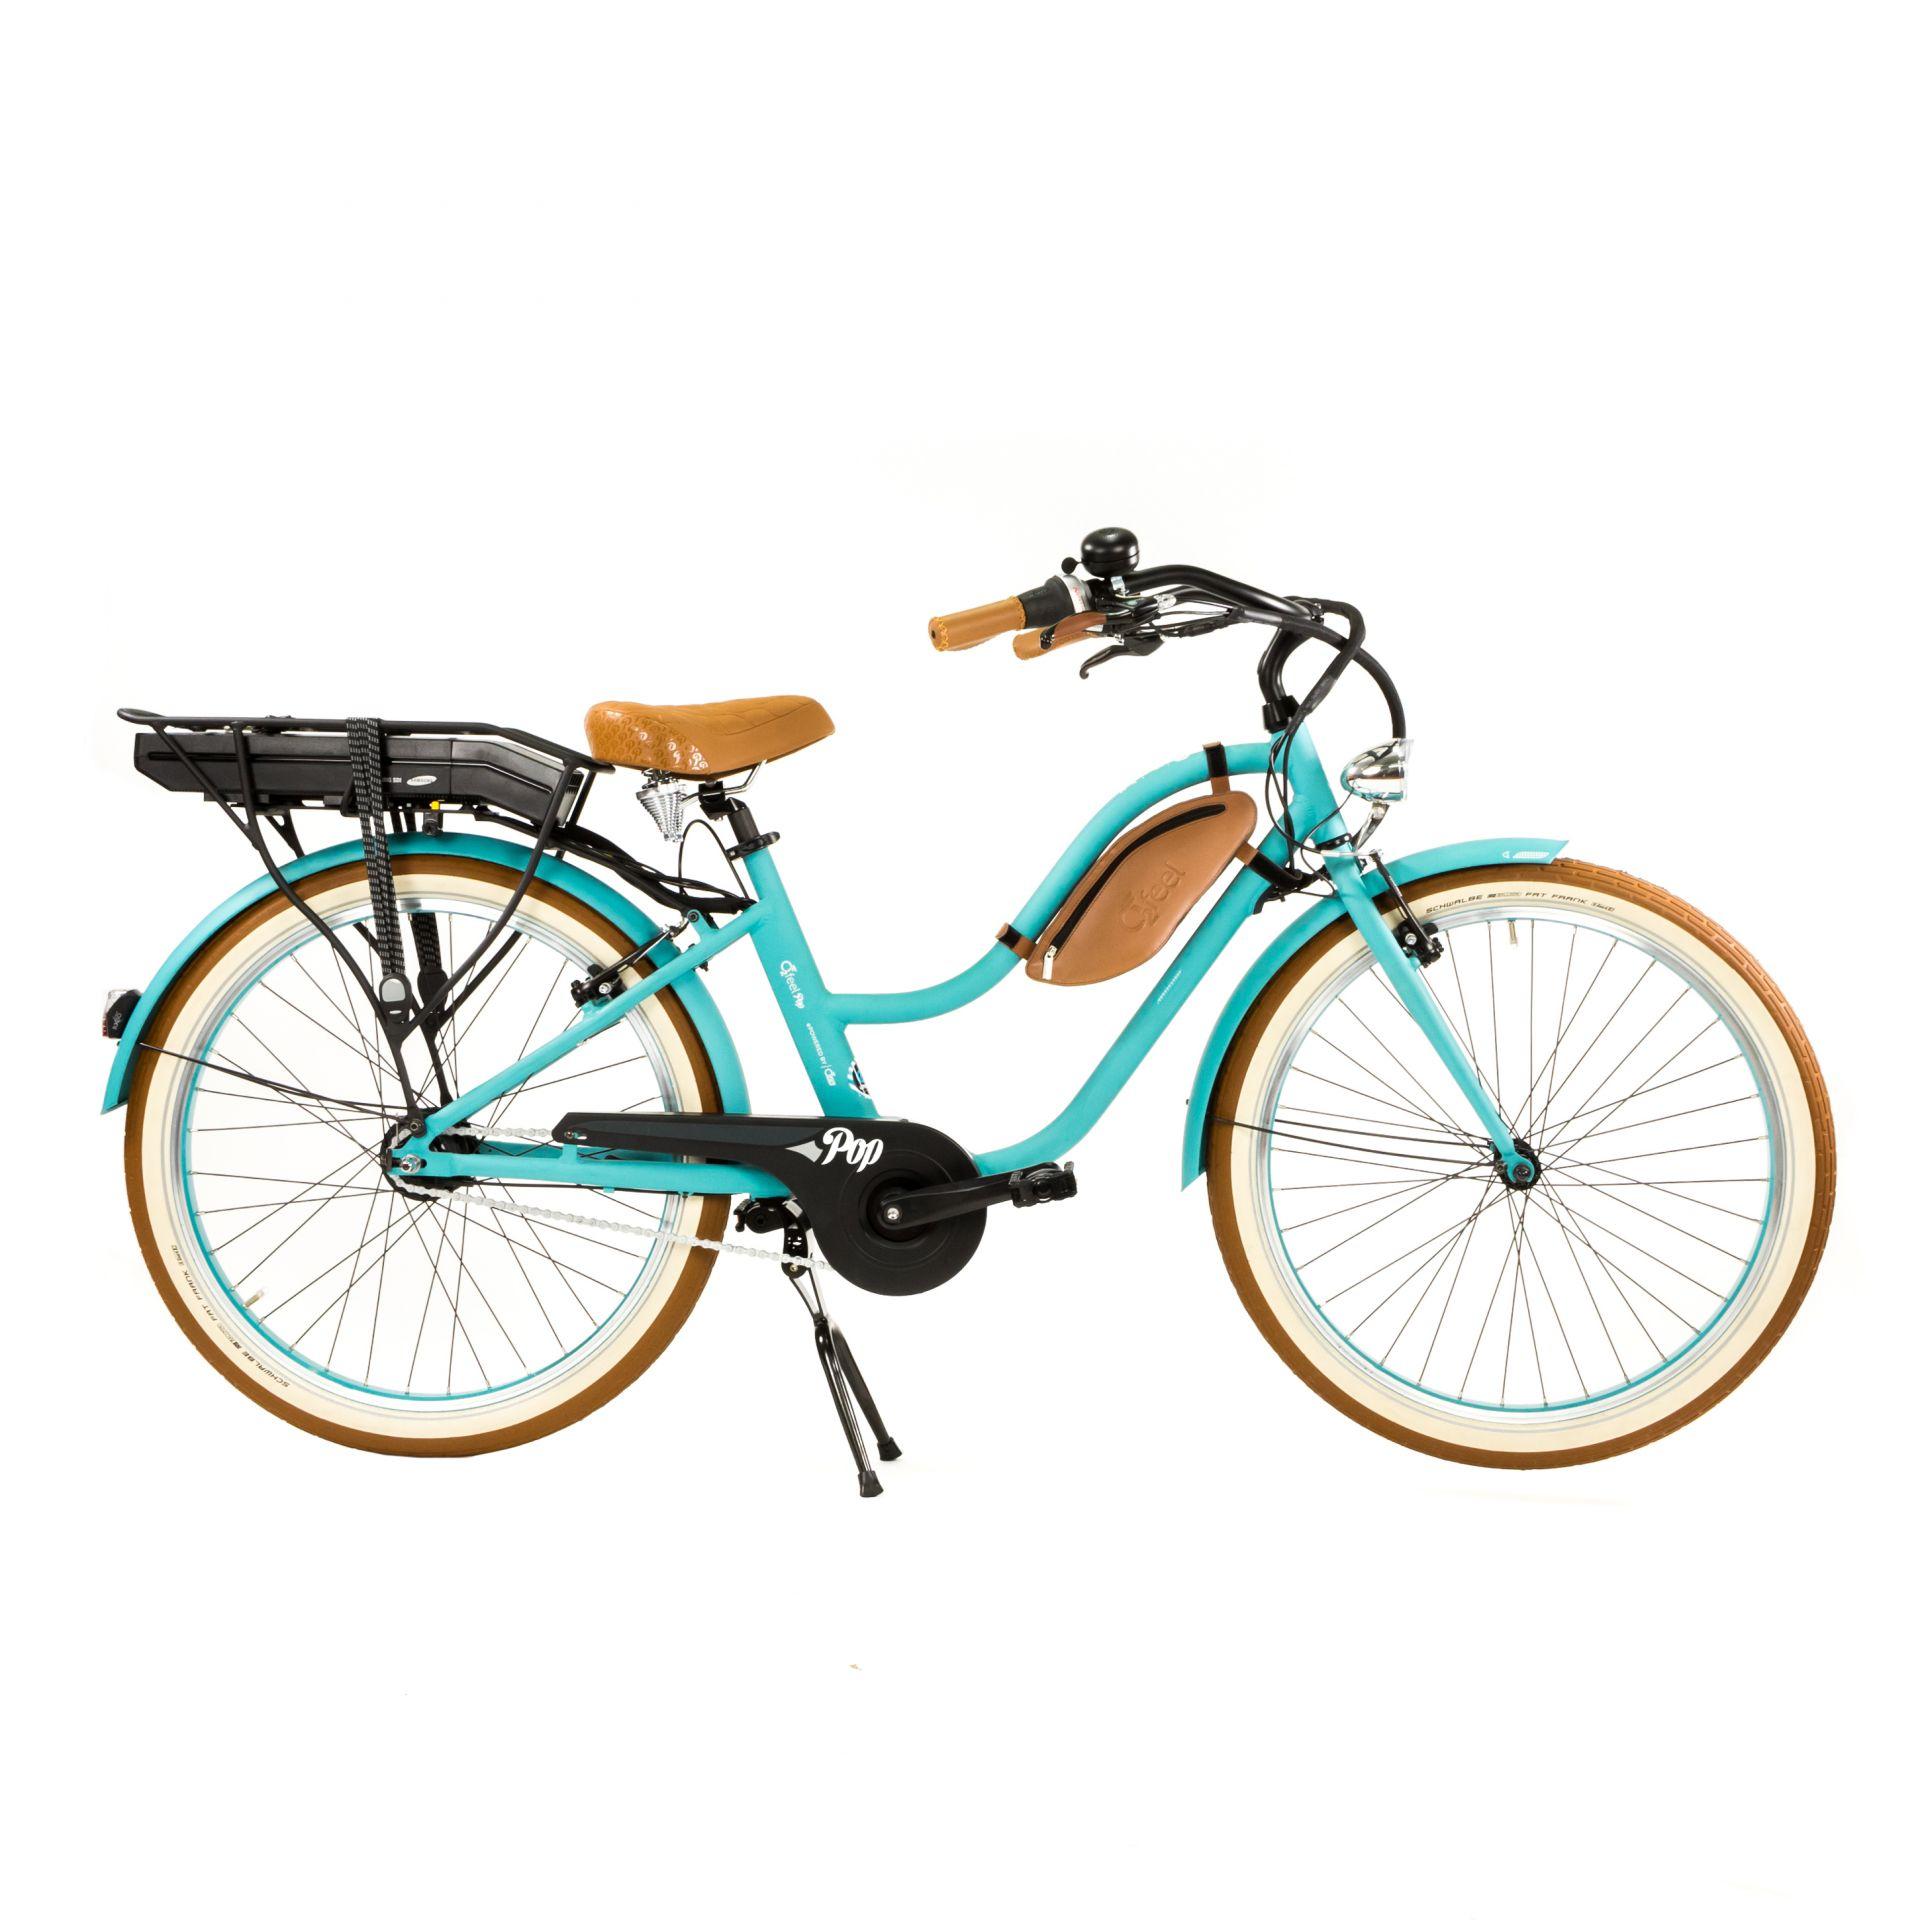 Vélo Cruiser électrique O2Feel Pop Femme N7C 374 Wh Vert océan